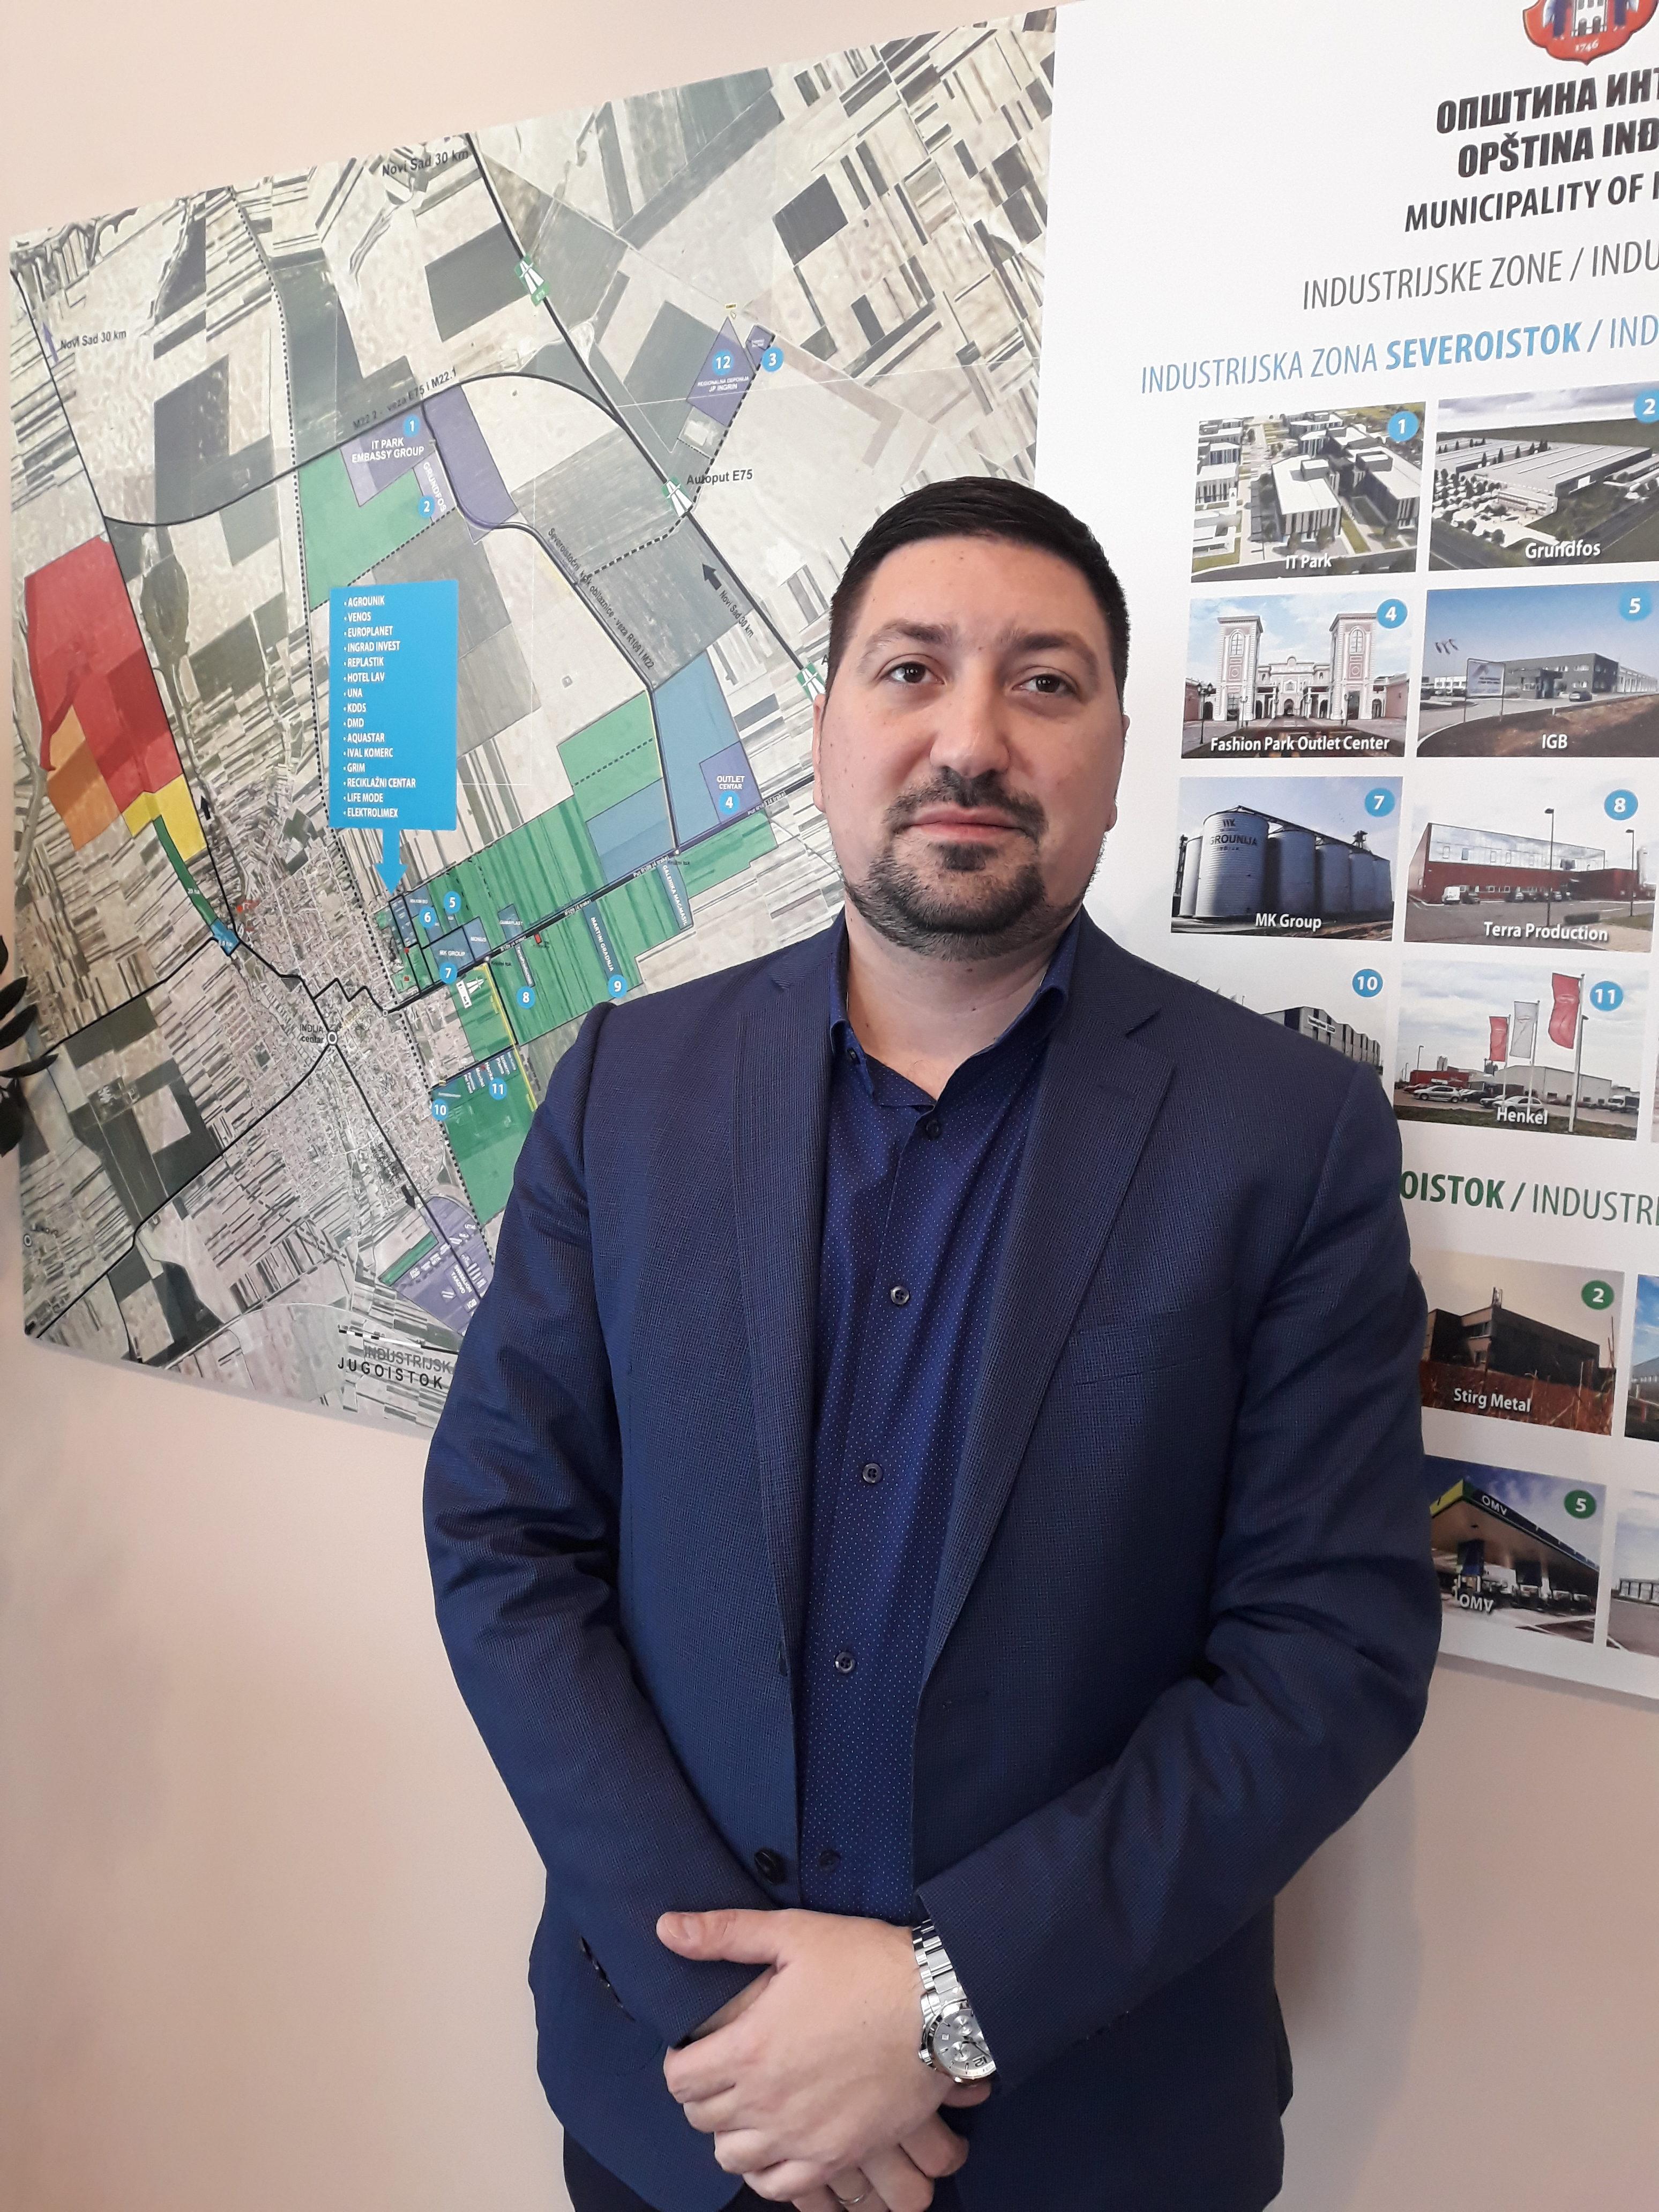 Intervju: Vladimir Gak, predsednik opštine Inđija